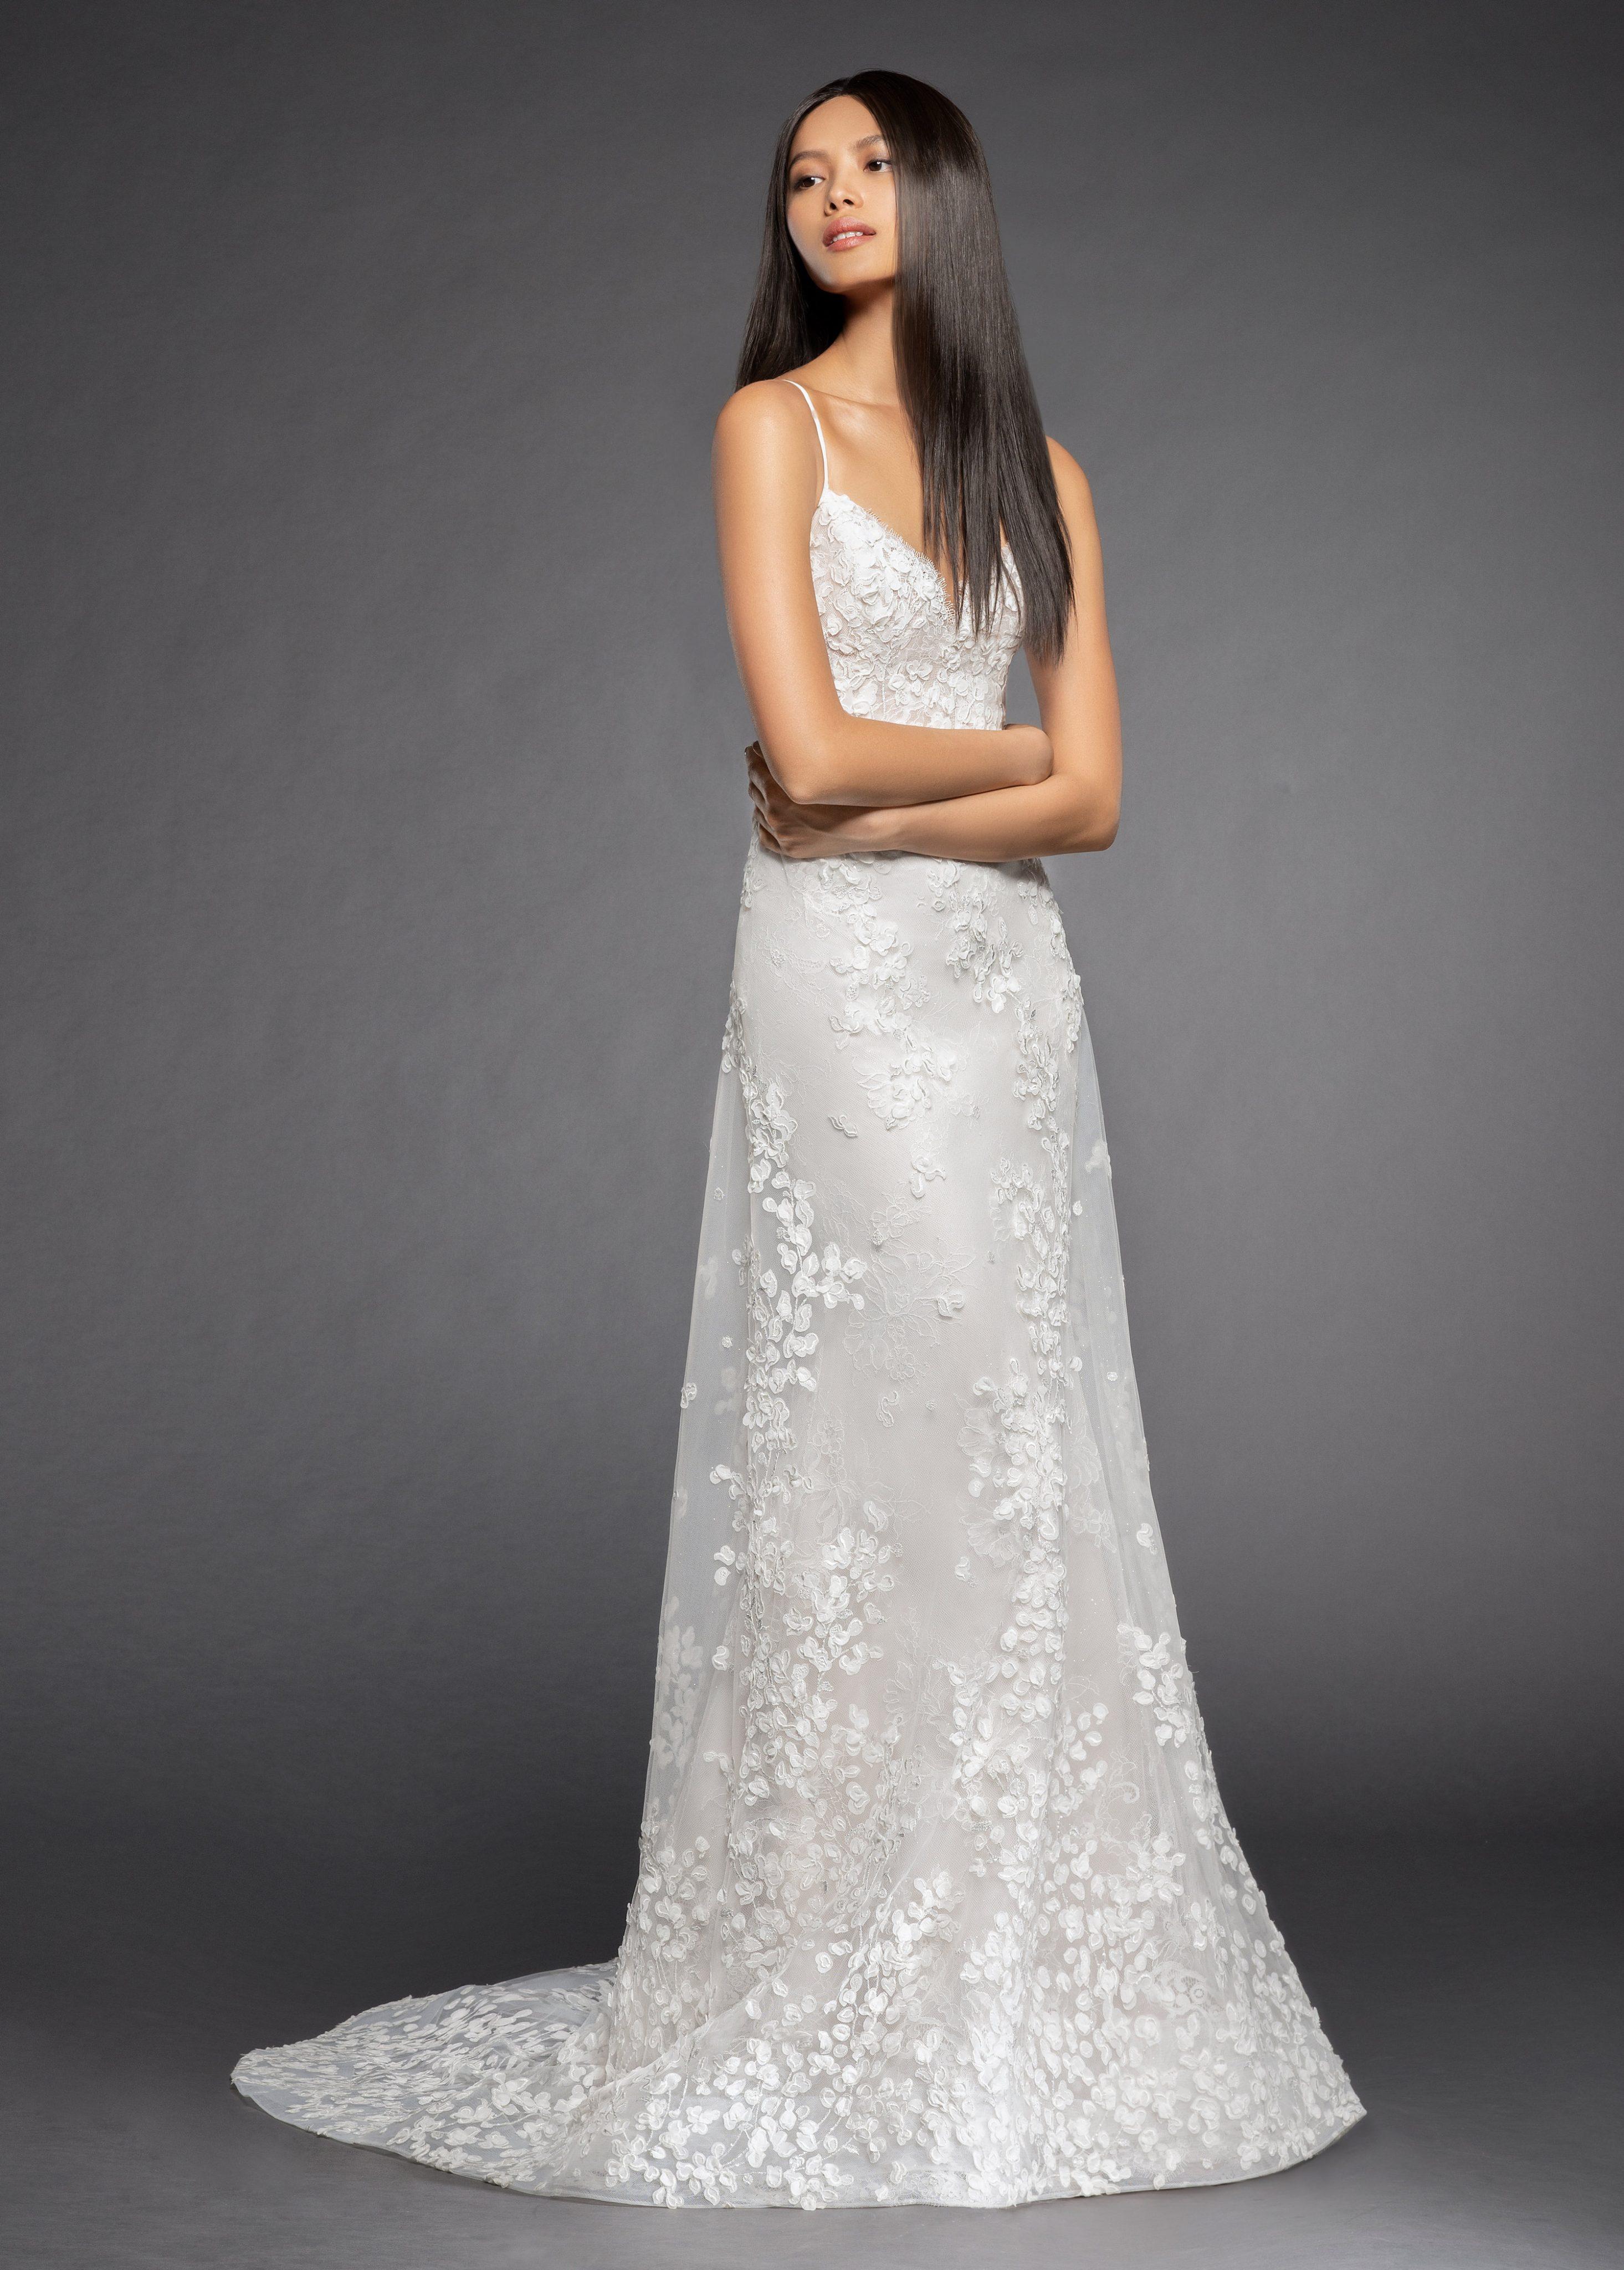 Spaghetti Strap Floral Applique A Line Wedding Dress